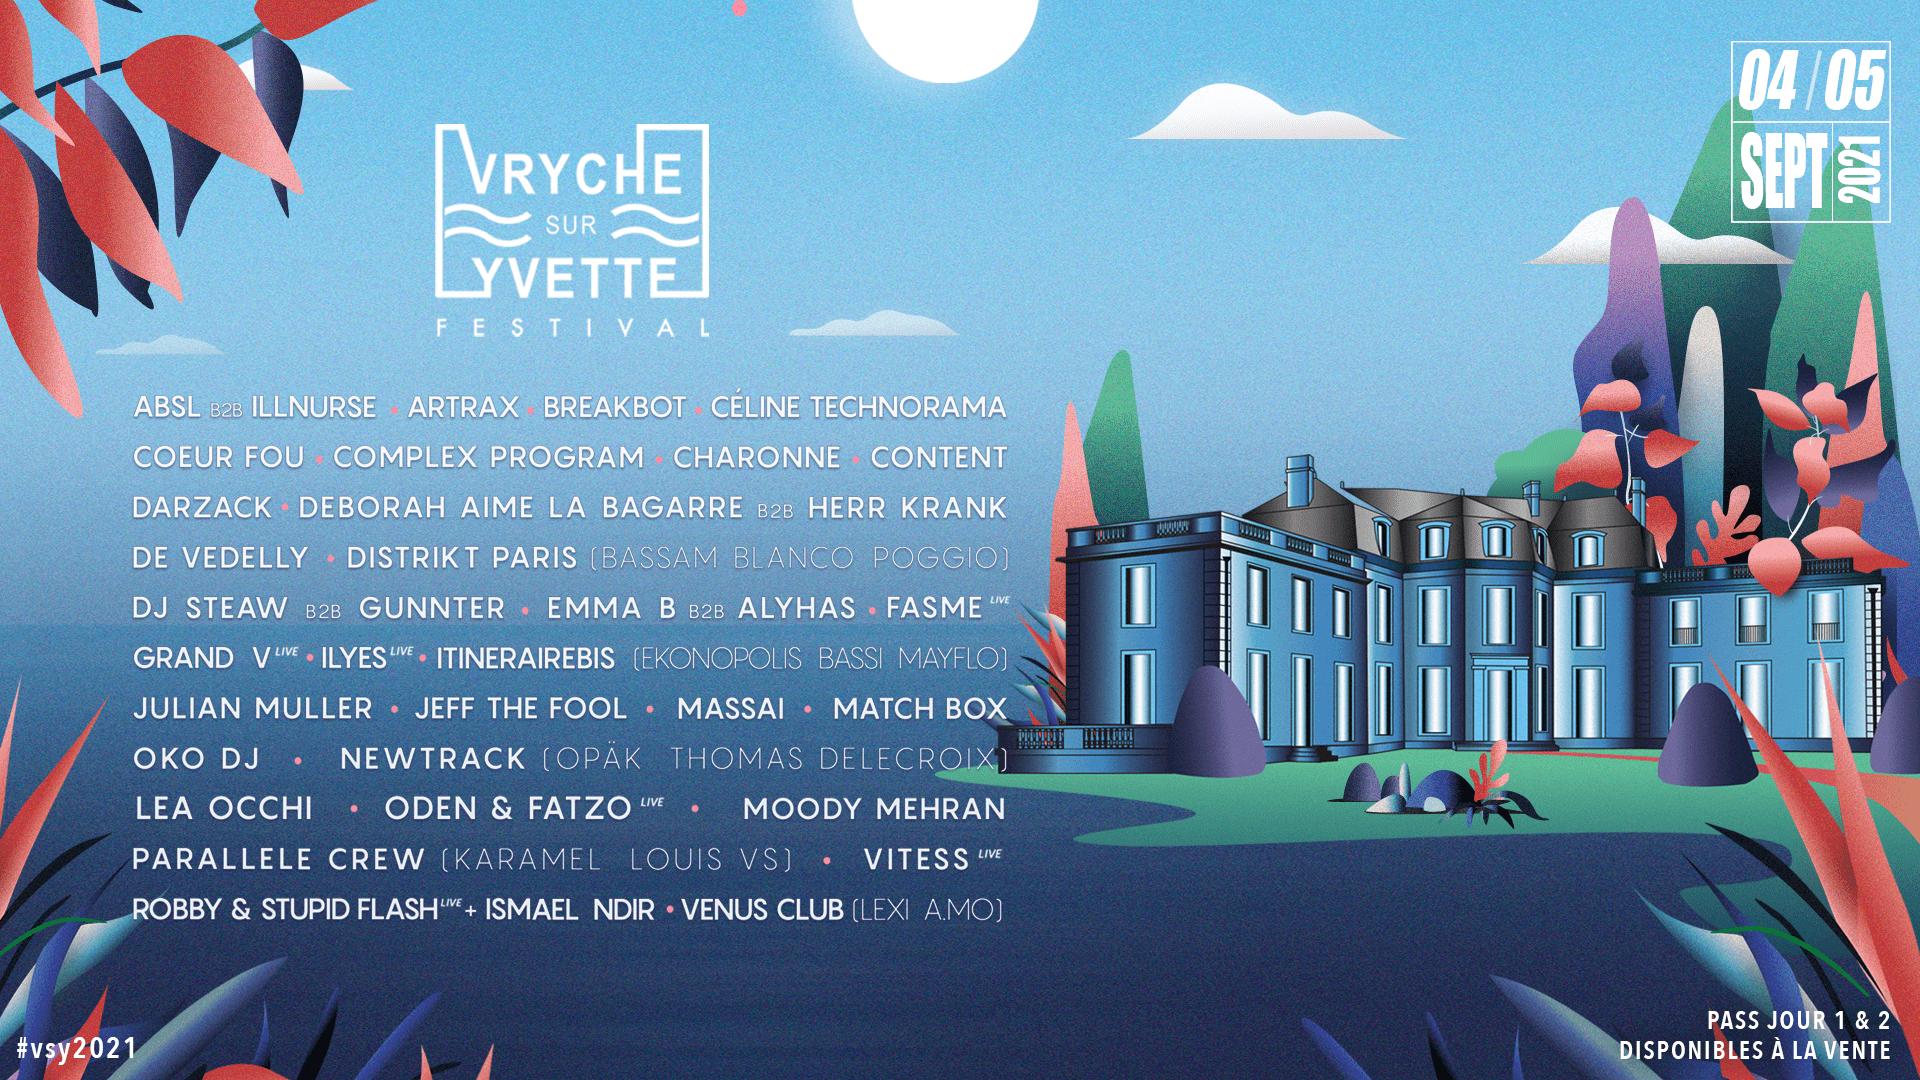 Vryche Sur Yvette Festival 2021